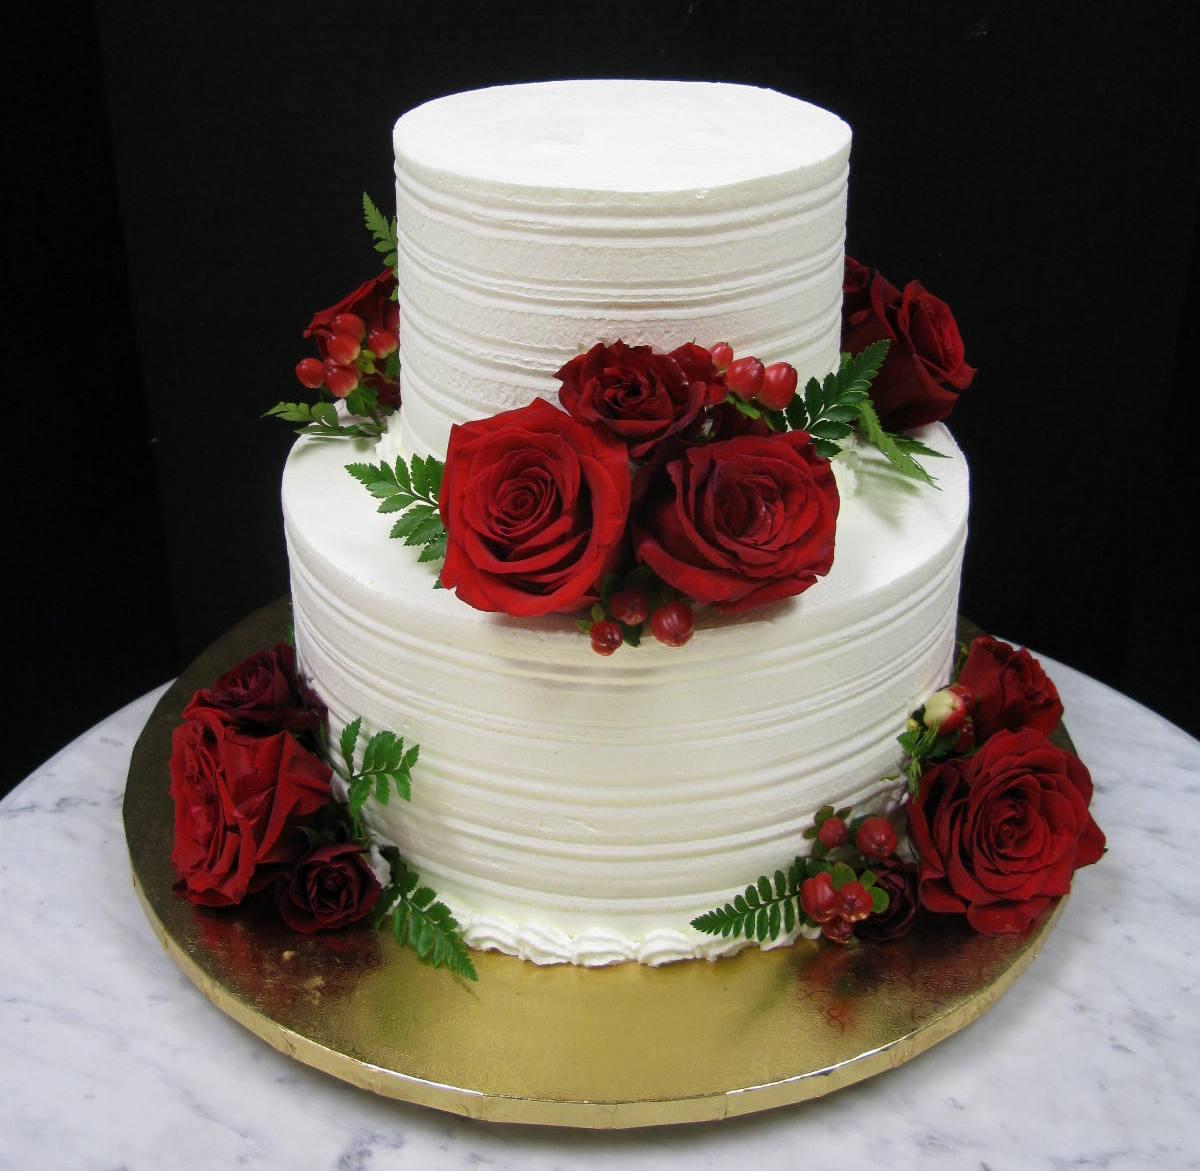 Whipped Cream Wedding